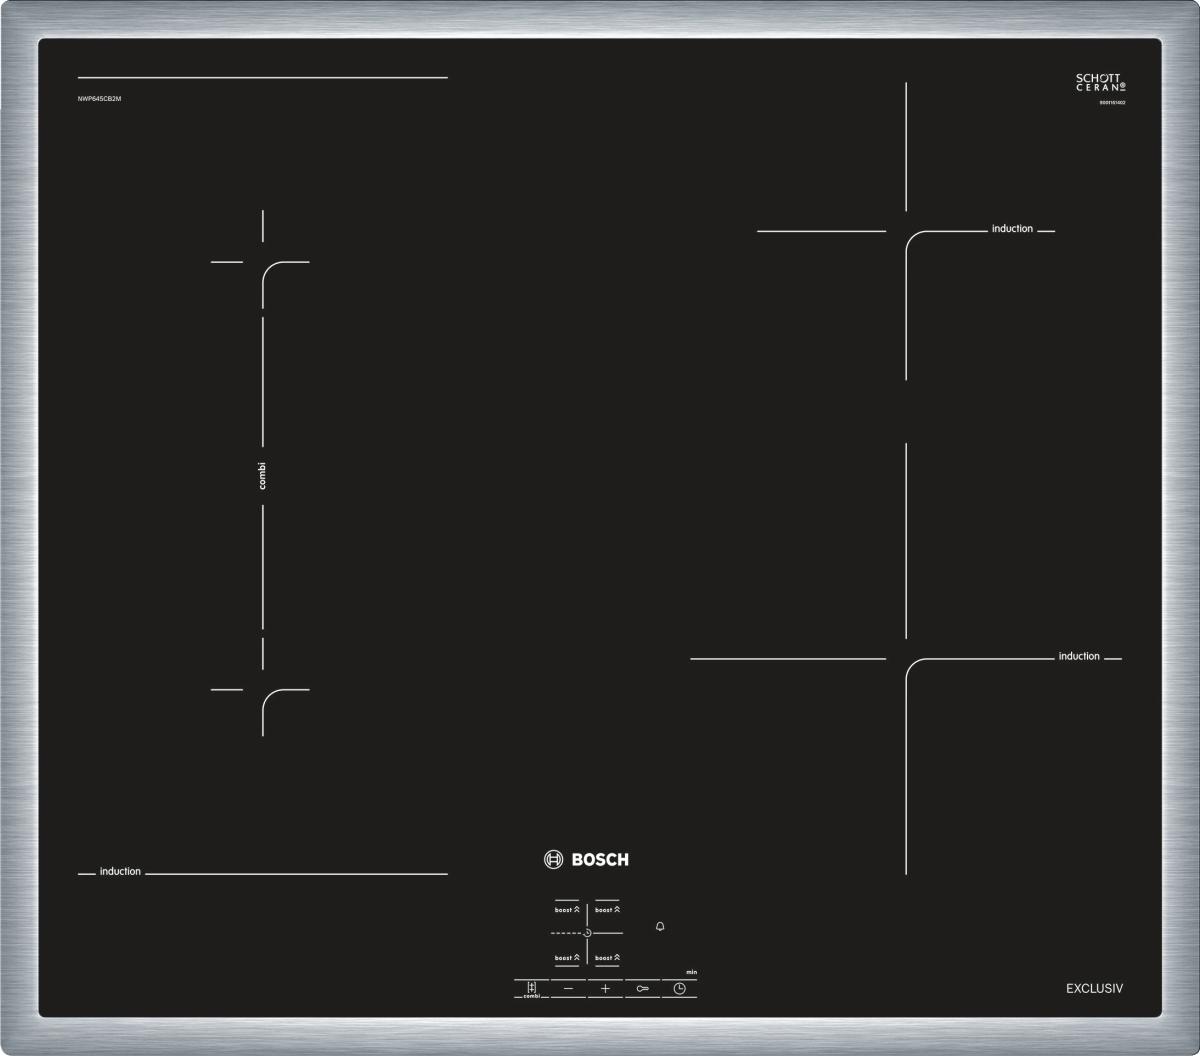 Bosch NWP645CB2M EXCLUSIV (MK)Edelstahl, umlaufender Rahmen 60 cm Induktions-Kochfeld Glaskeramik